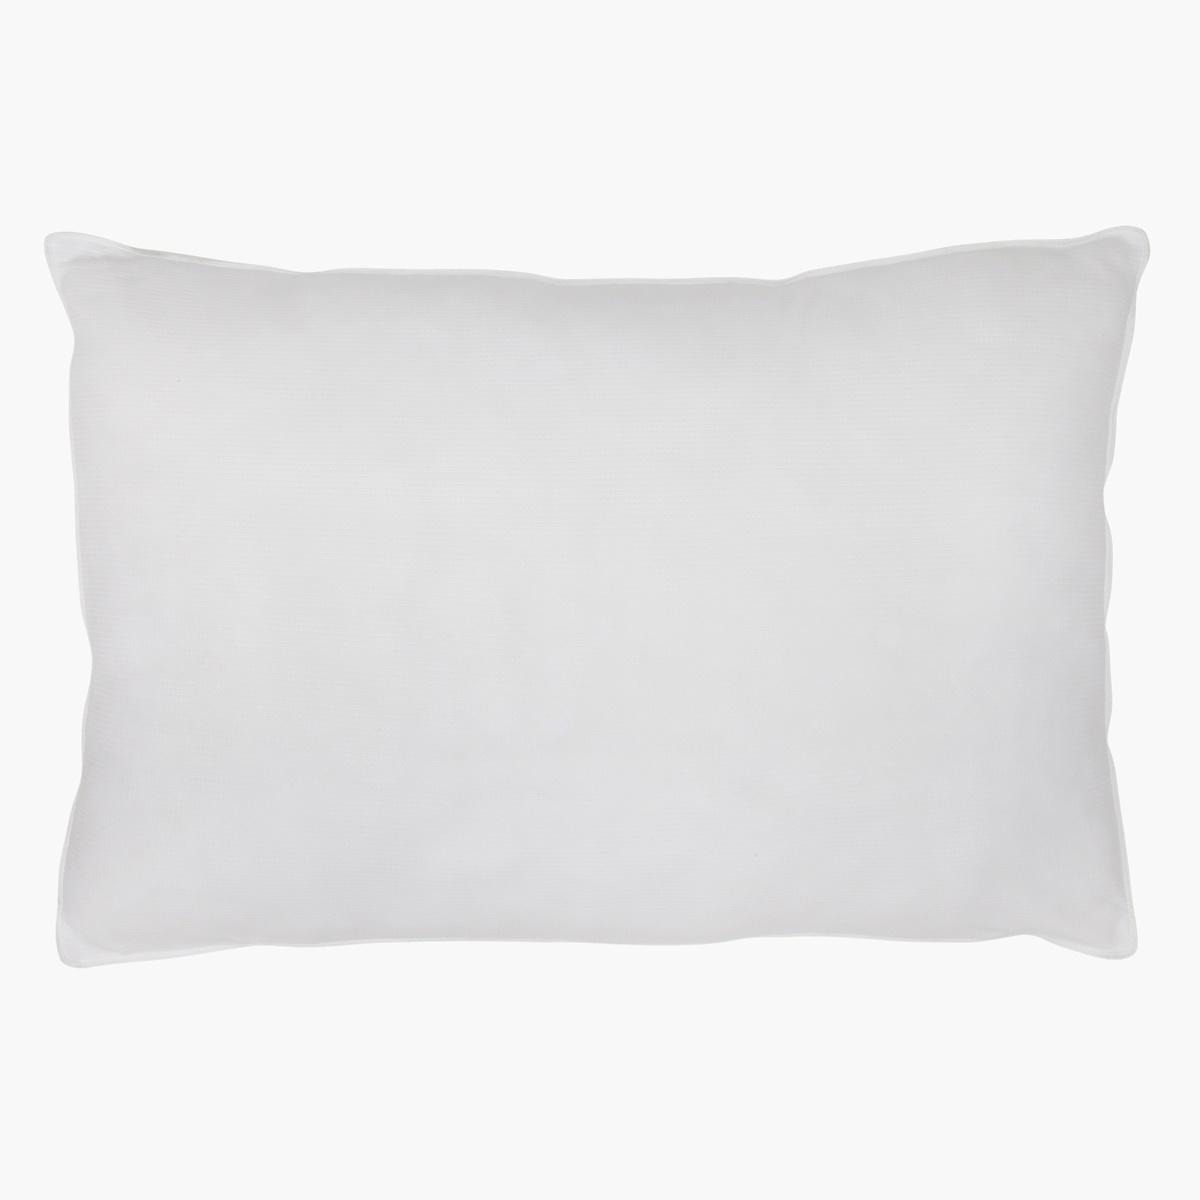 Cool Plus Pillow - 50x75 cms